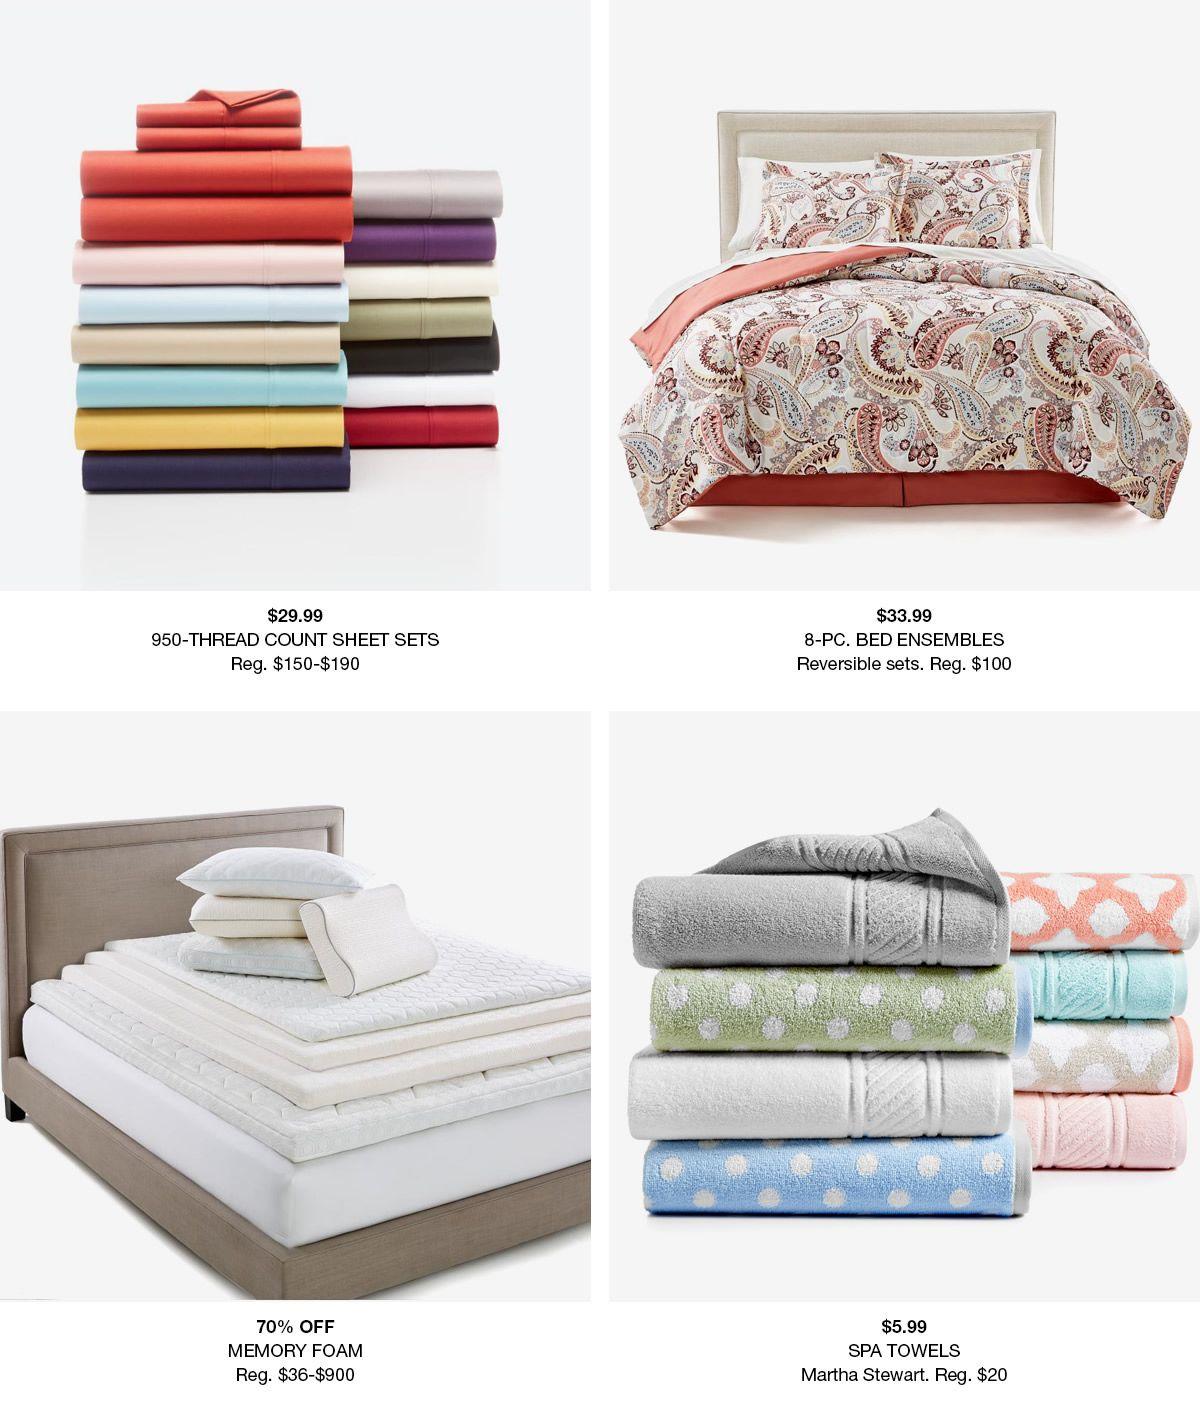 Bedding Linens Bath Macys Eighty Eight Holiday Lip Pencil Set 2999 950 Thread Sheet Sets 3399 8 Piece Bed Ensembles 70 Percent